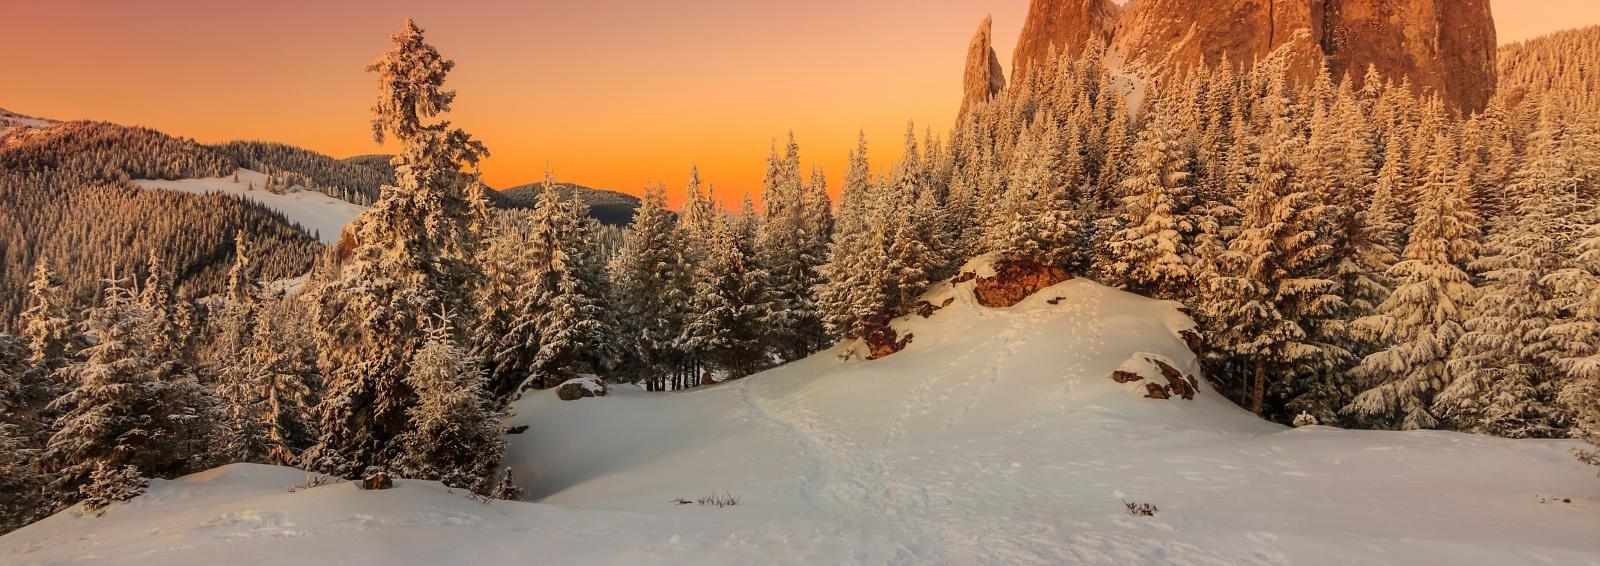 Transylvania Winter Walk & Snowshoe, Romania - Tour